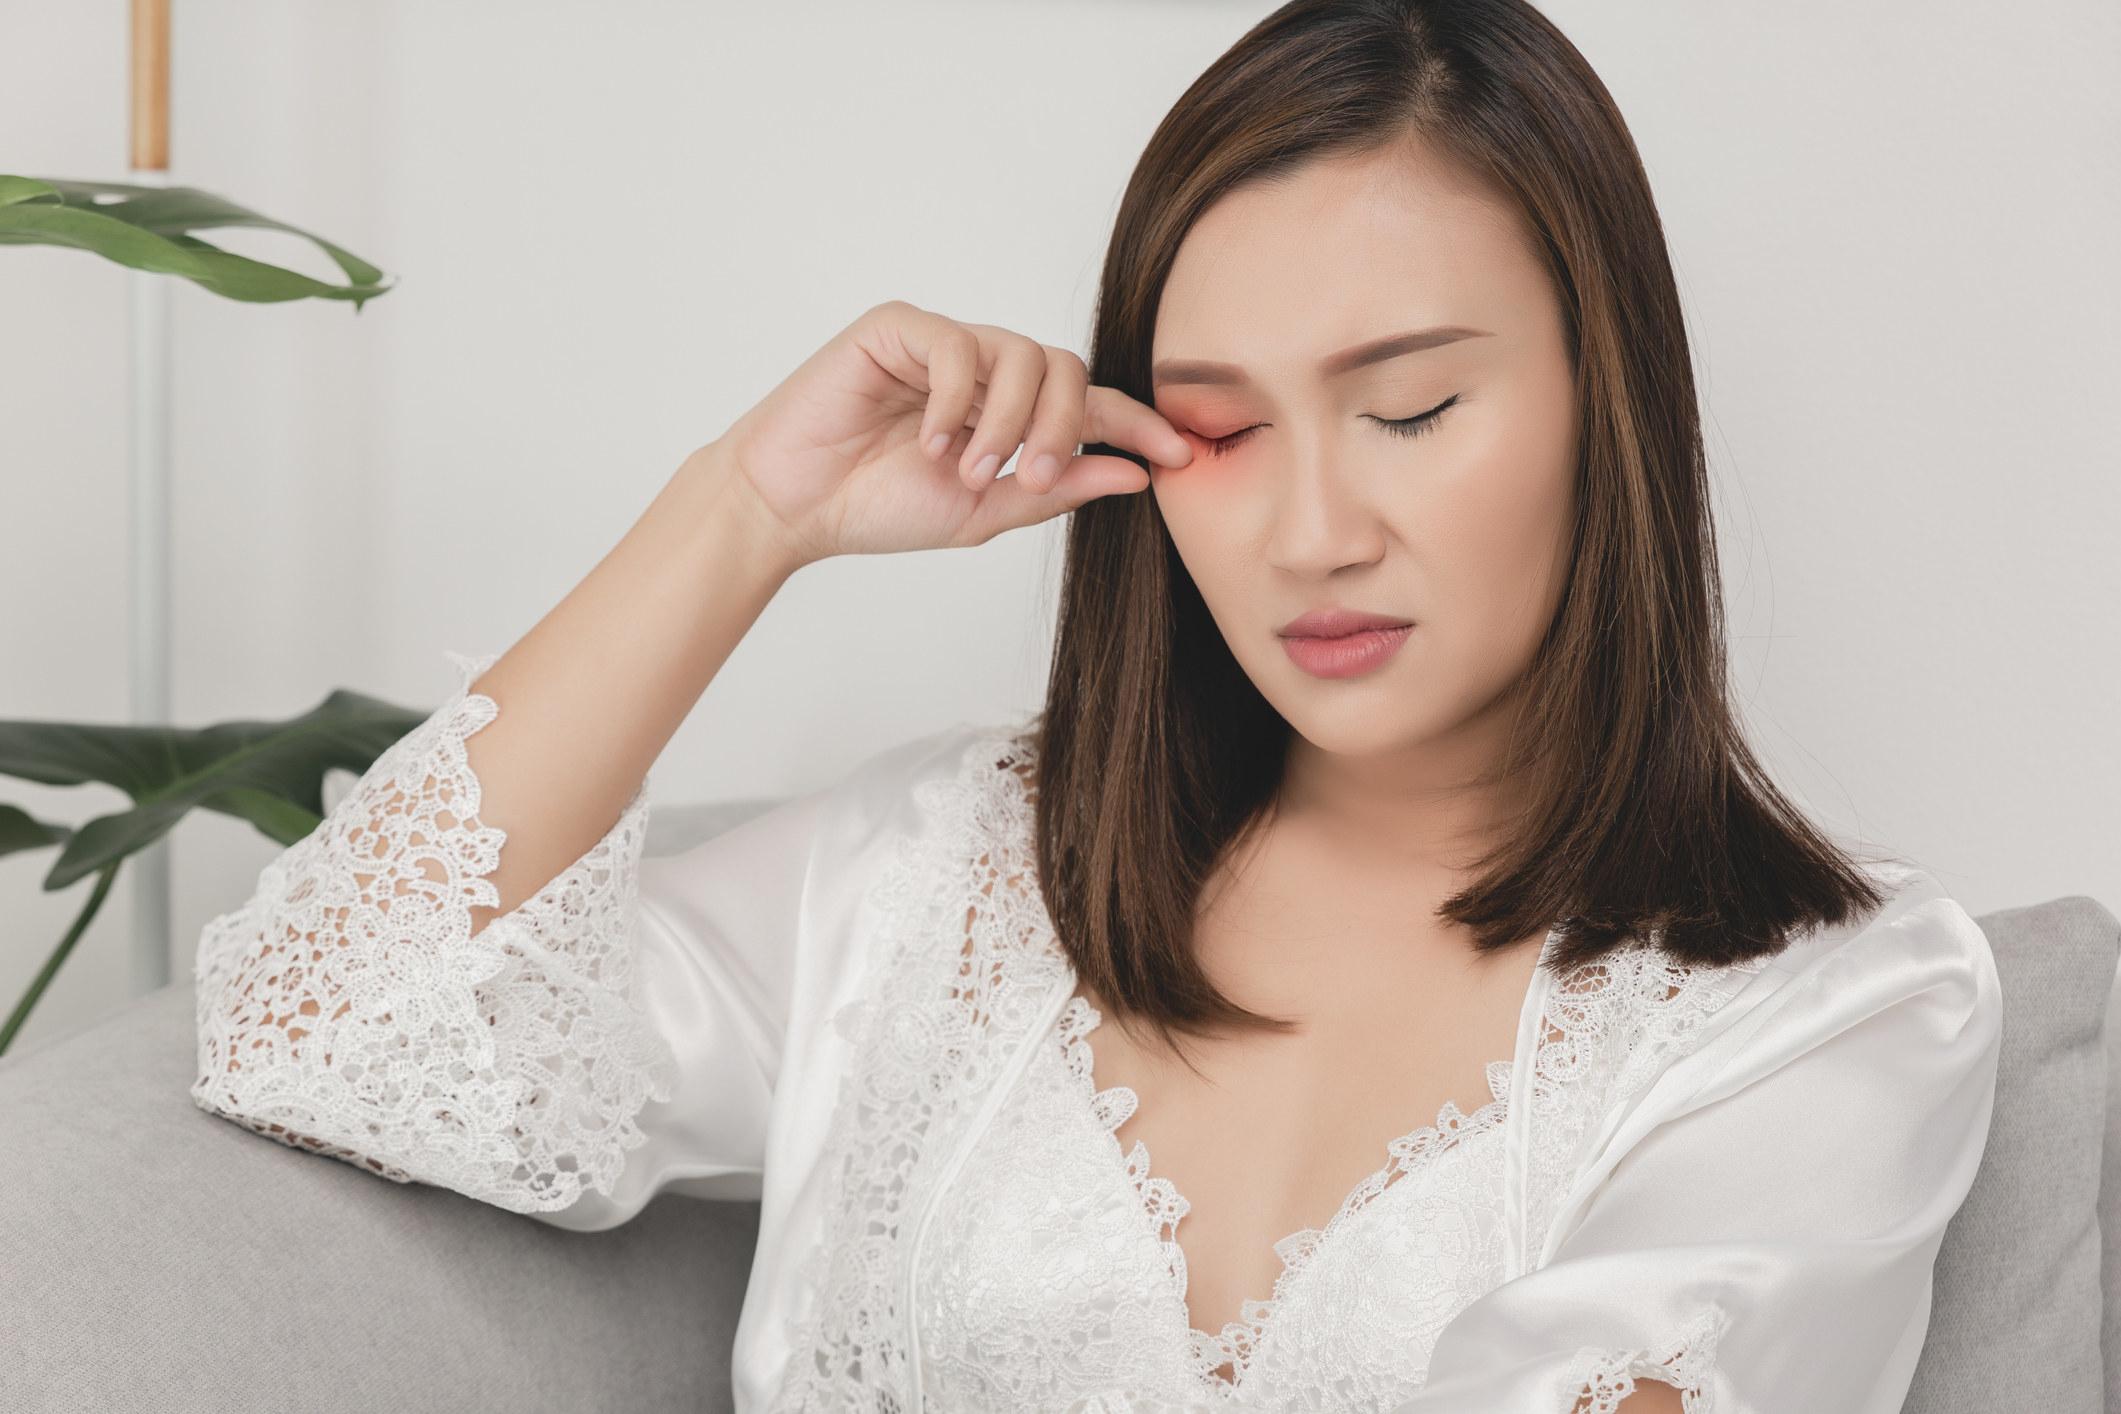 Woman rubbing her dry eye